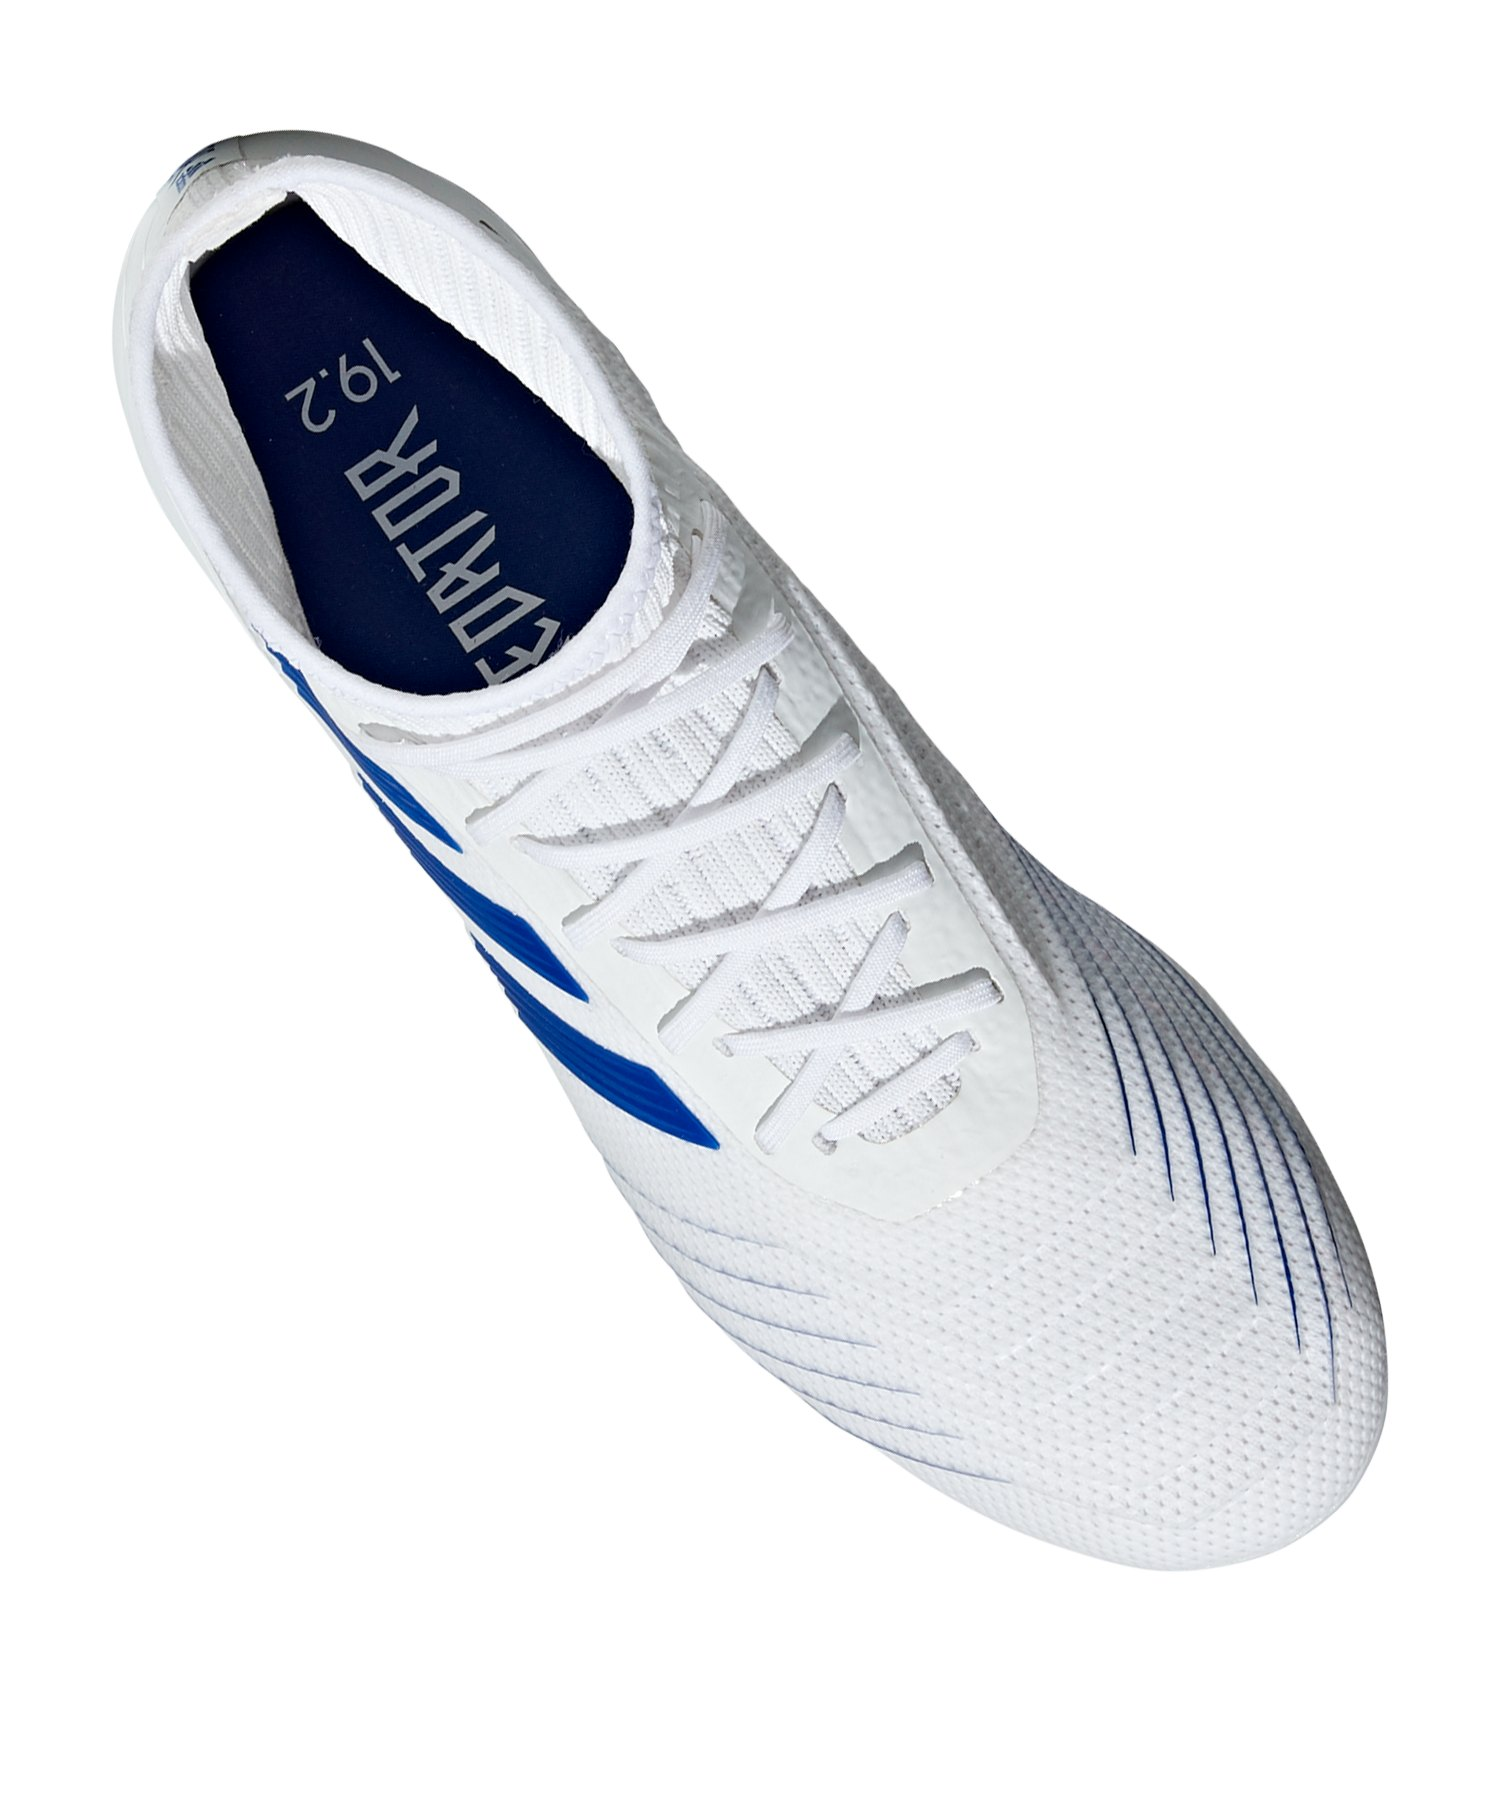 Fg 19 Adidas Weiss Blau Predator 2 dsthQr